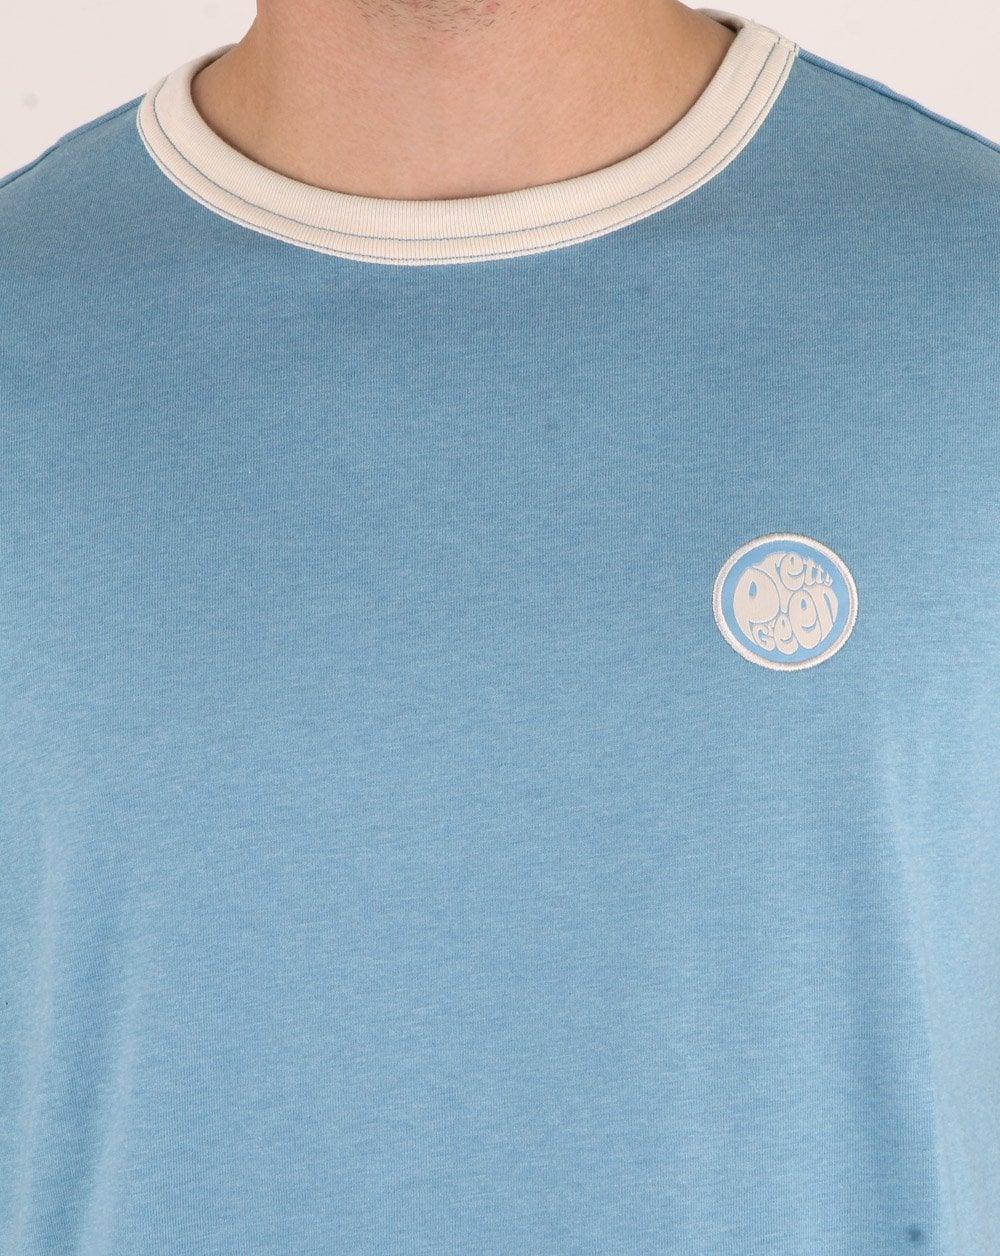 Nouveau Pretty Green Milford Ringer badge XXL T-shirt blanc cassé marron S9GMU15000143